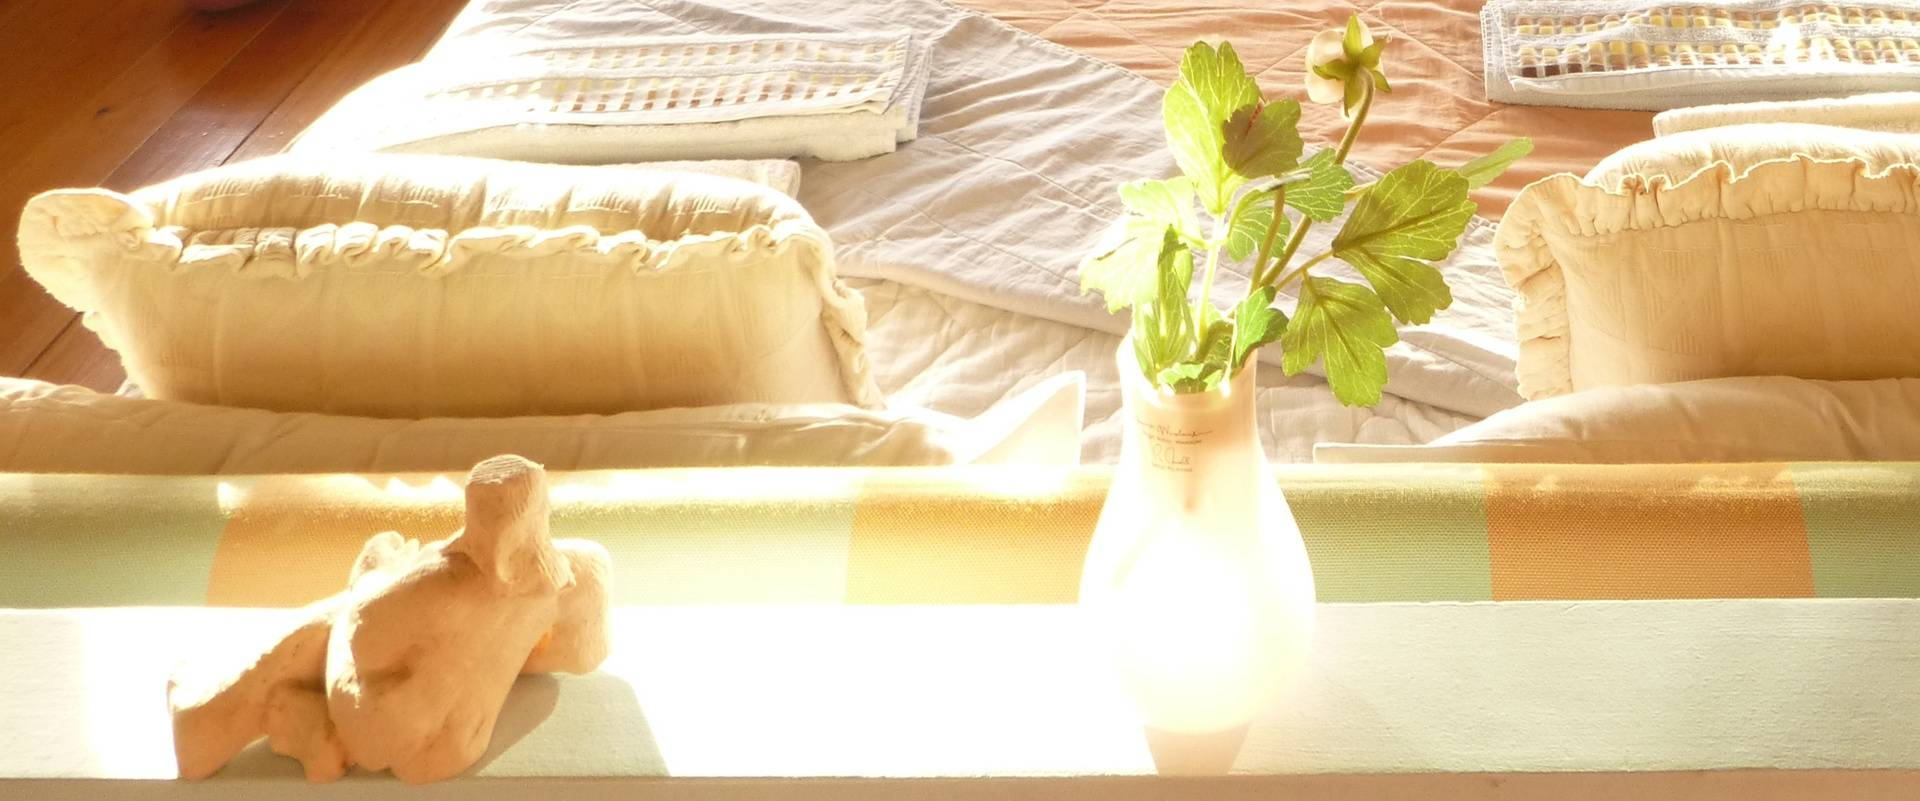 detail master bedroom 3